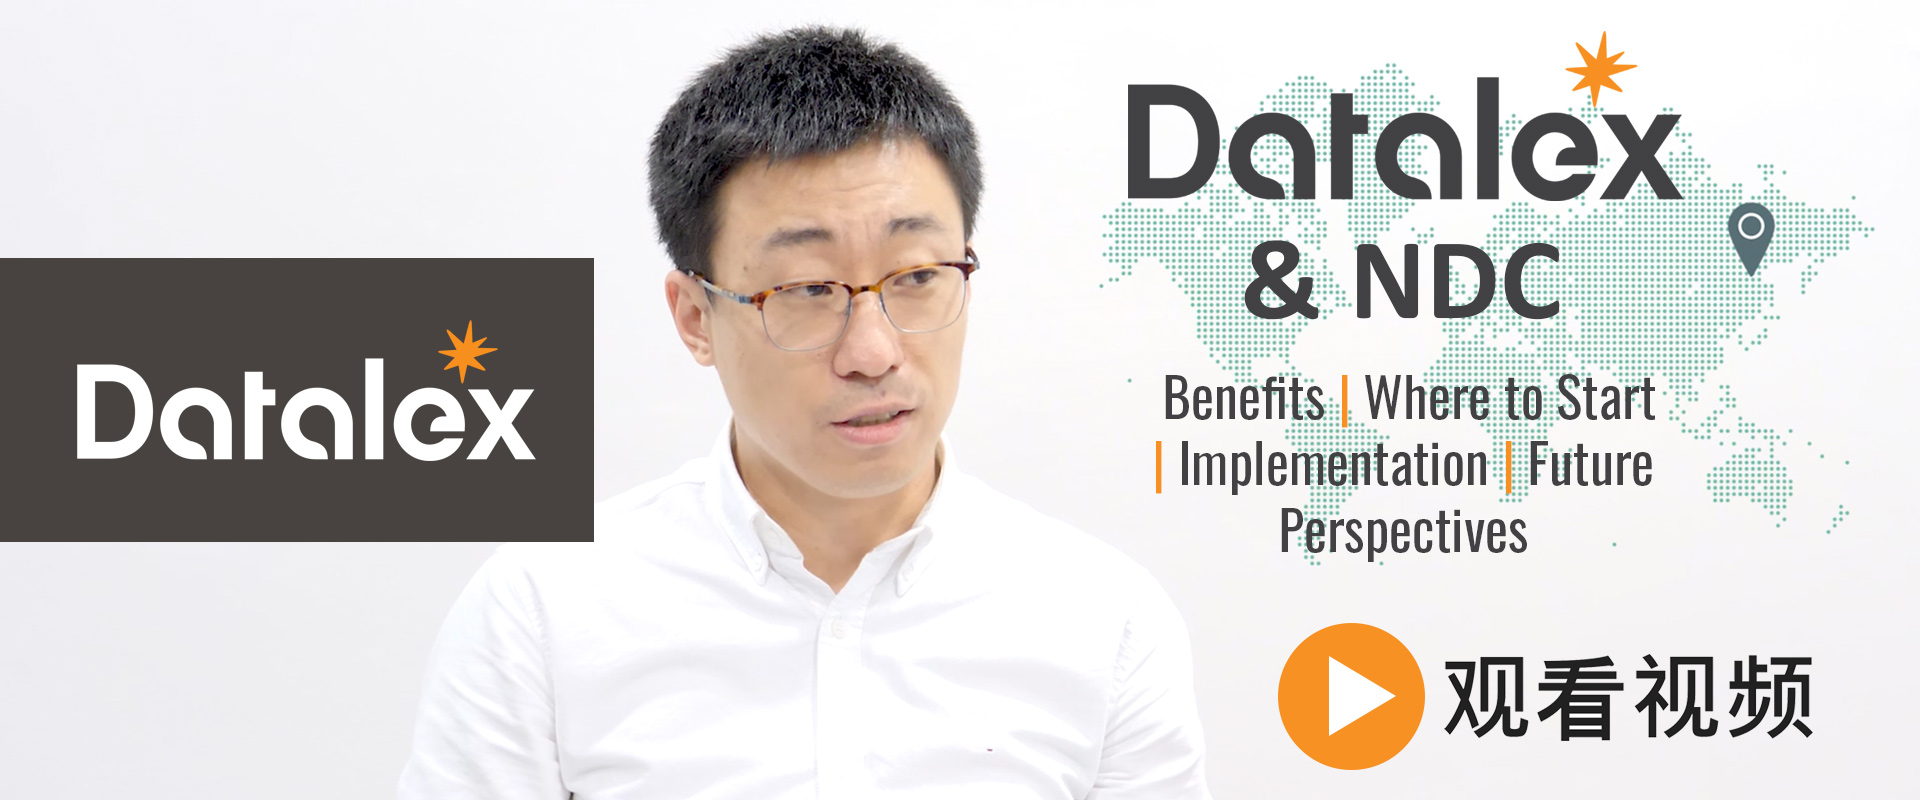 Datalex和NDC